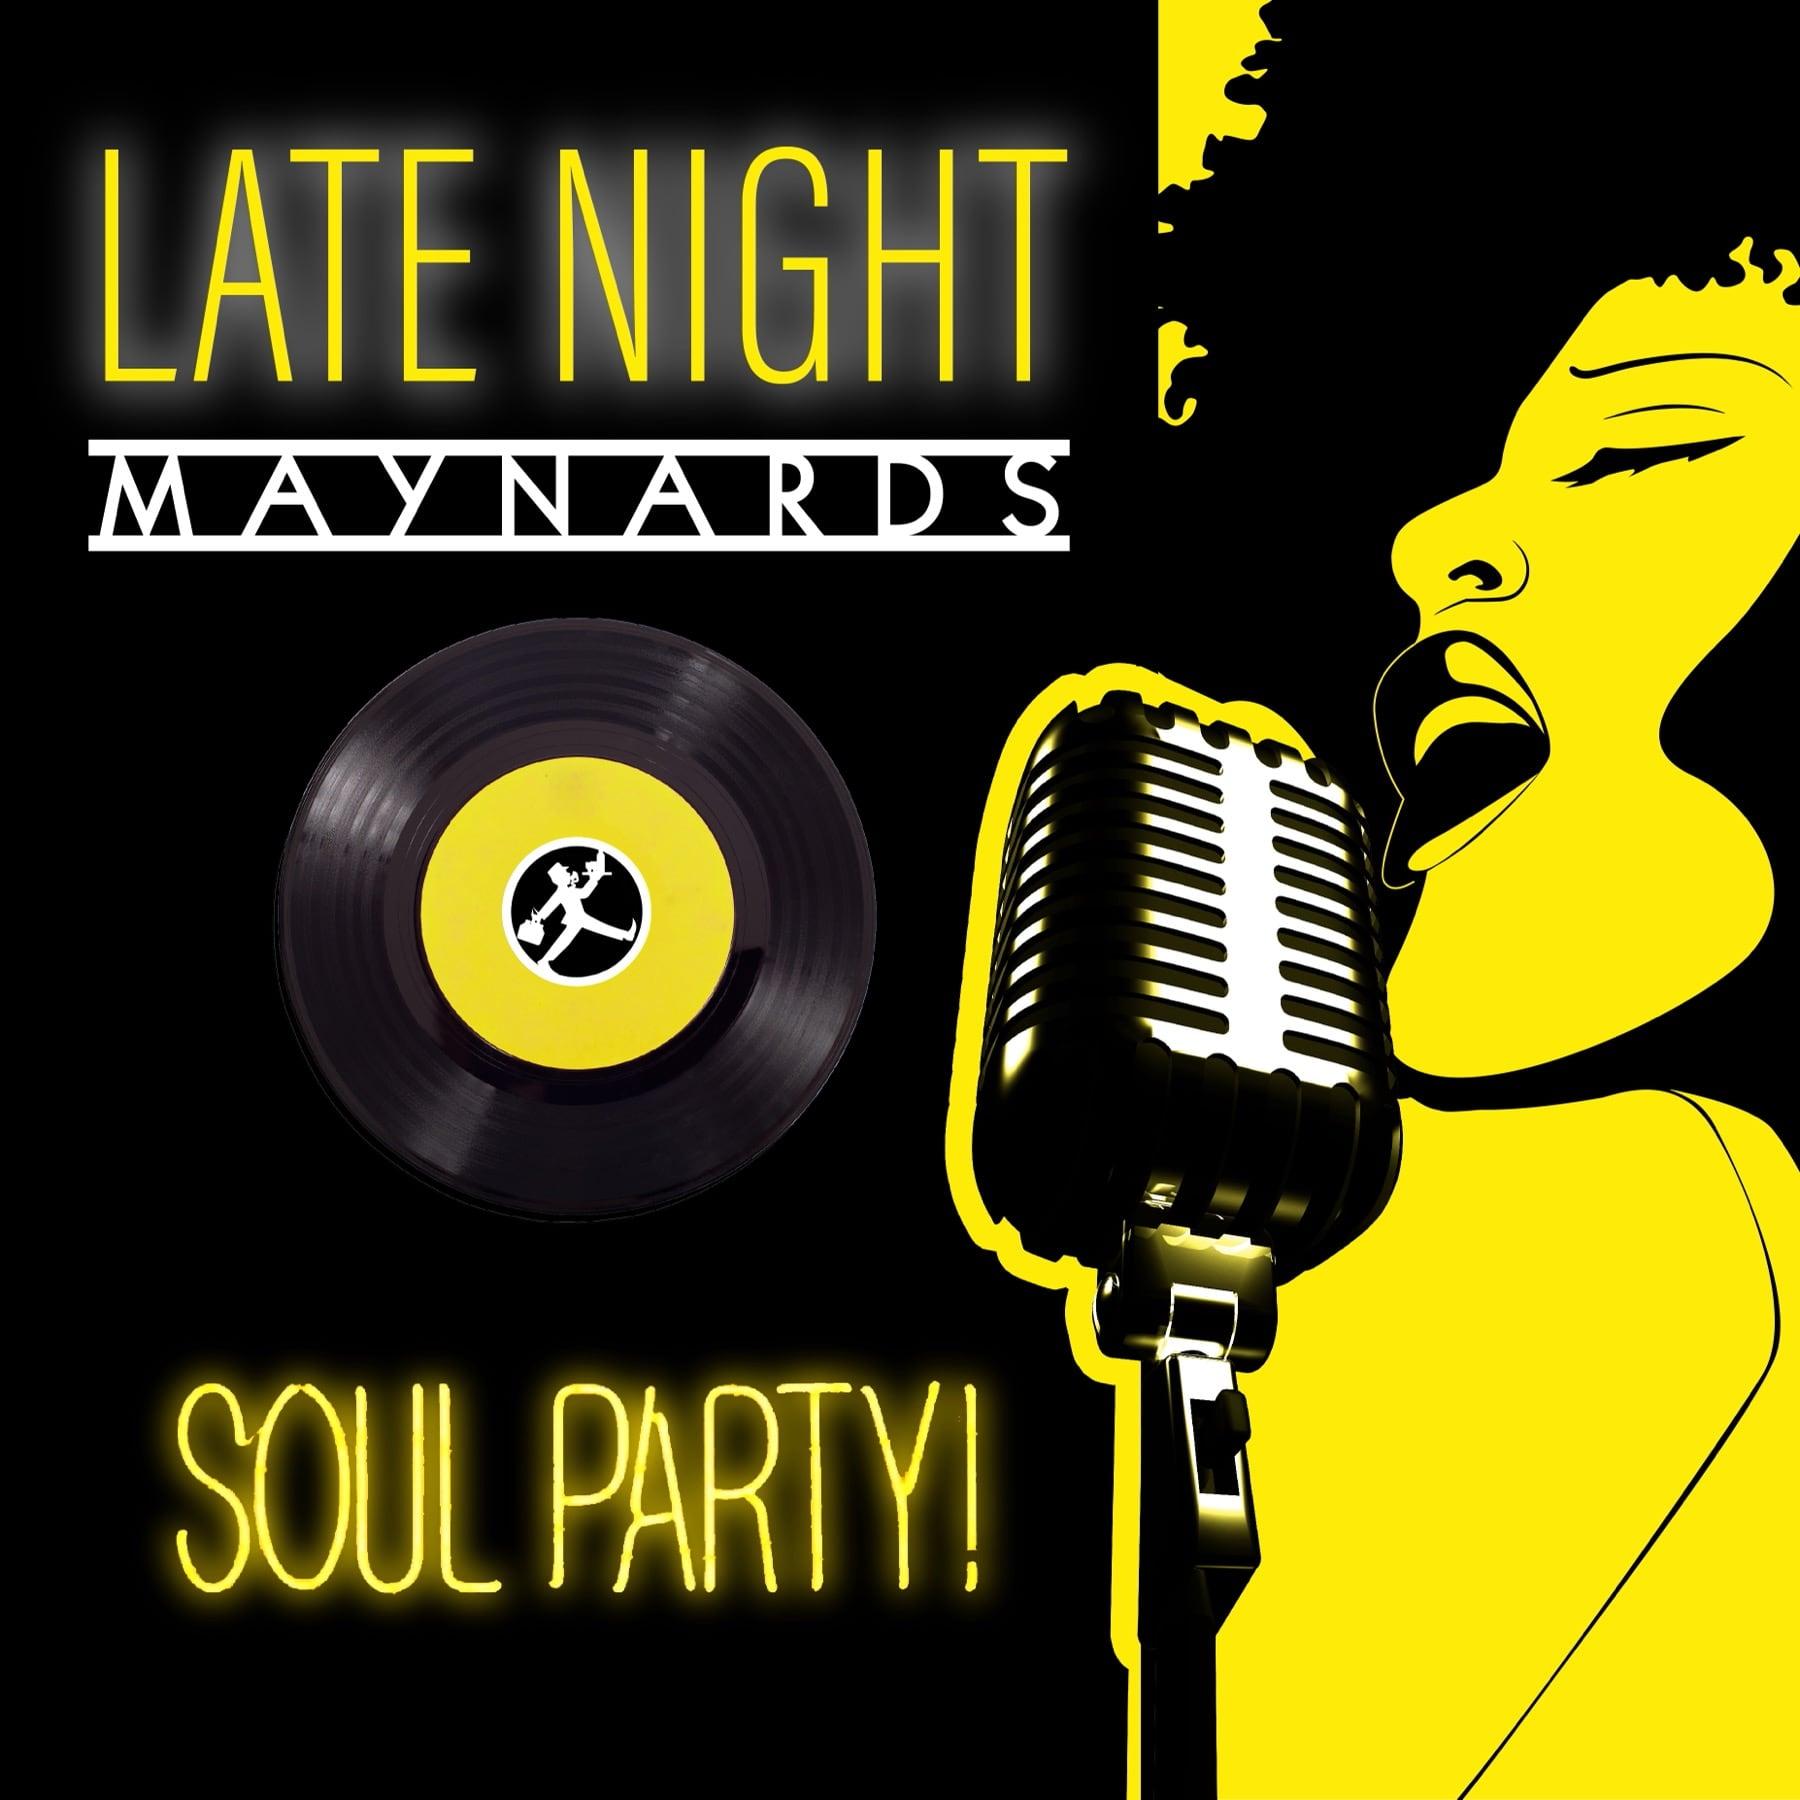 Maynards Late Night Soul Party  DJ John Payne  Tucson